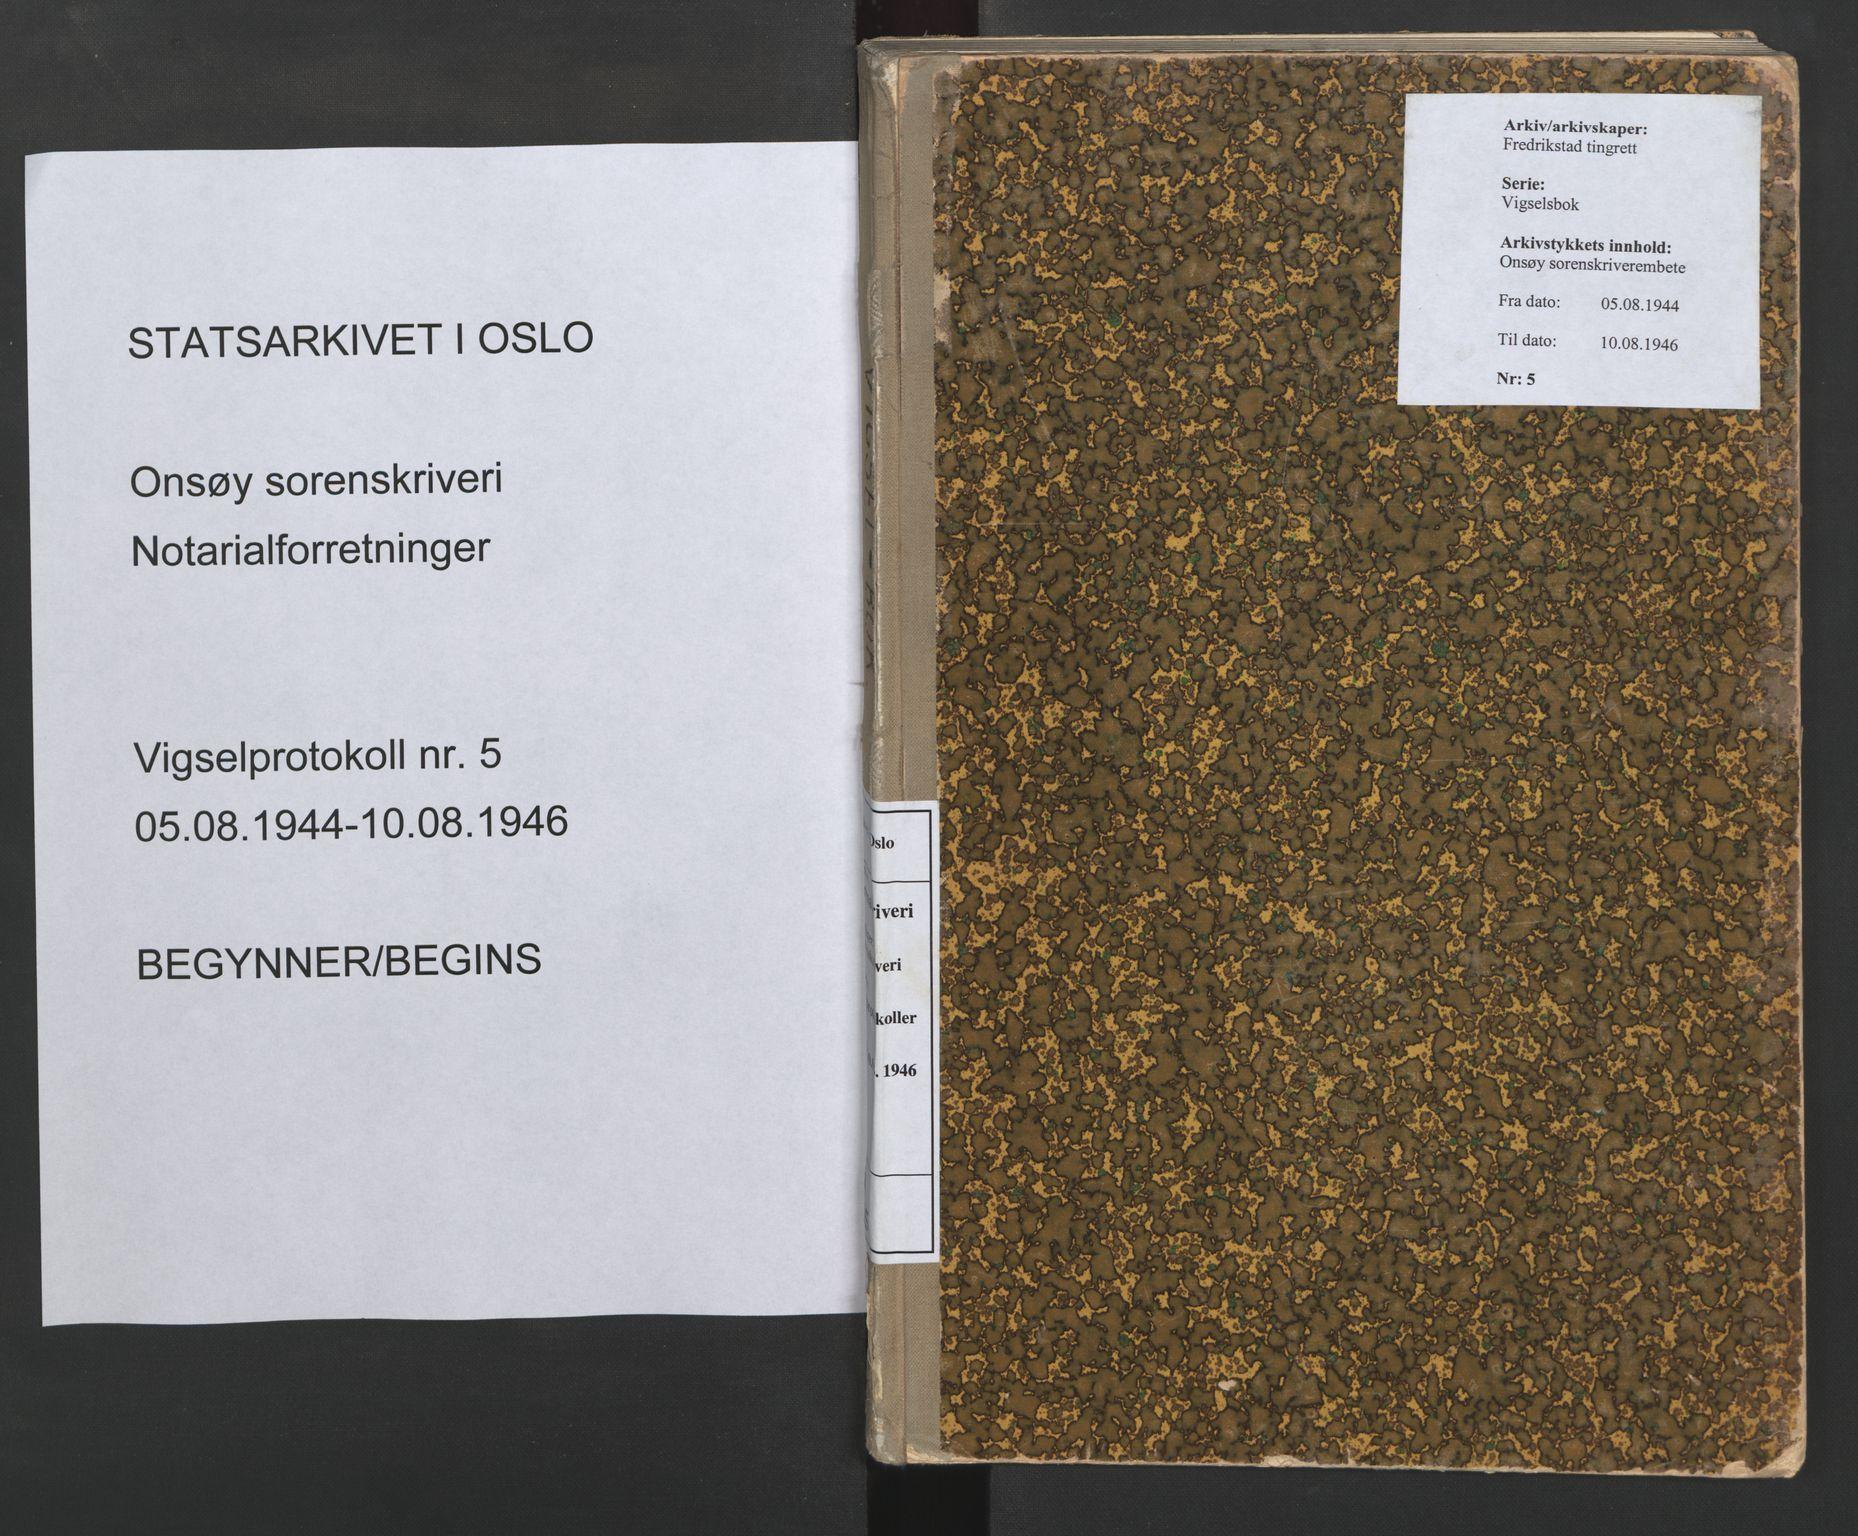 SAO, Onsøy sorenskriveri, L/La/L0005: Vigselsbok, 1944-1946, s. upaginert